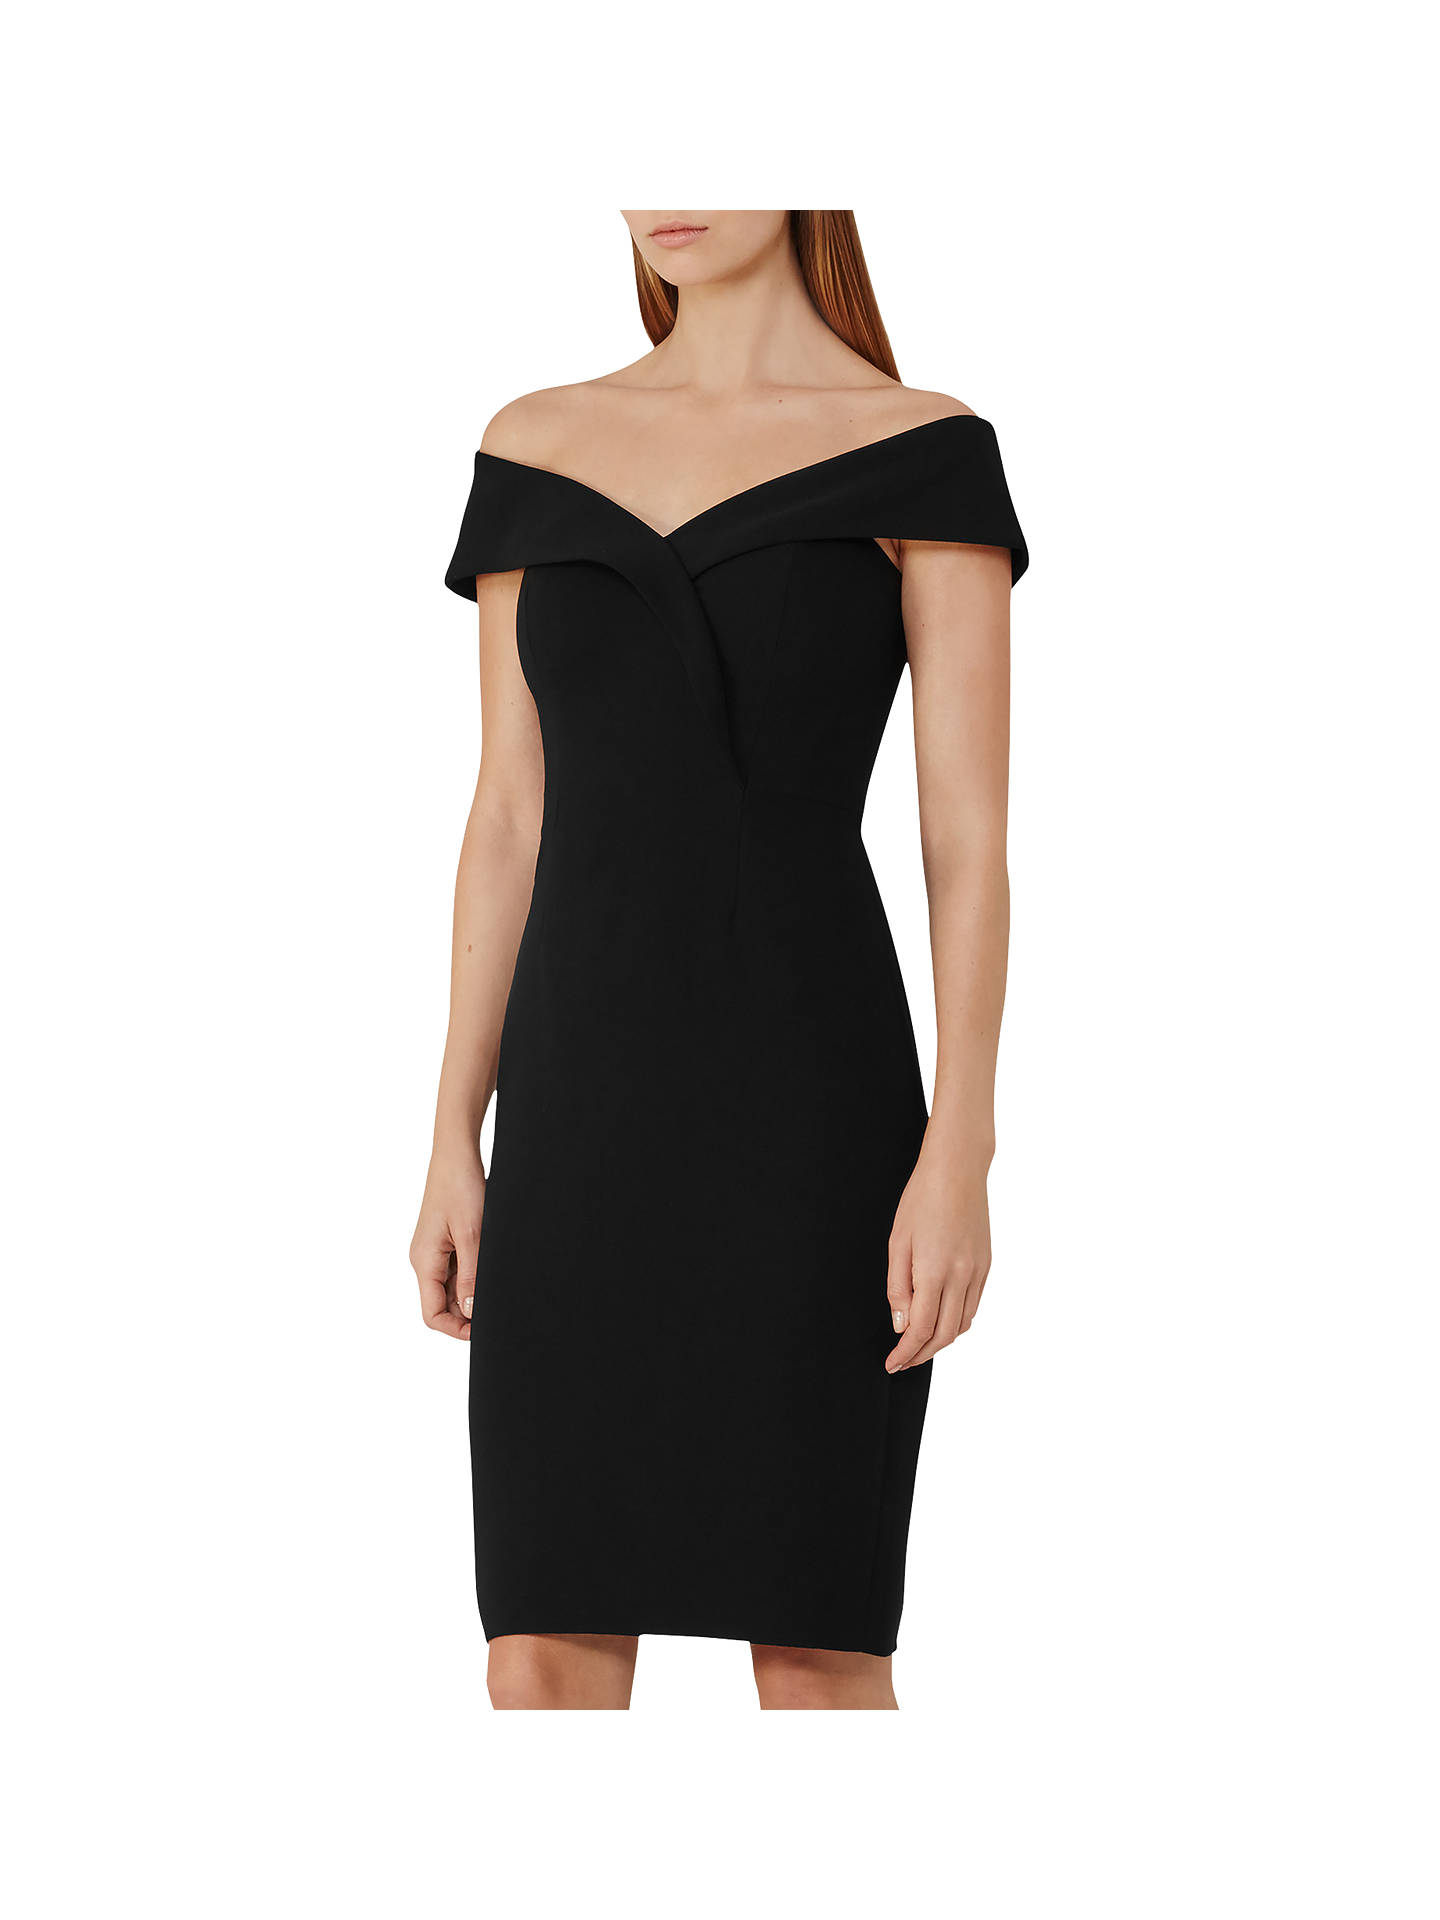 82925bd5e8e6 Buy Reiss Haddi Off The Shoulder Dress